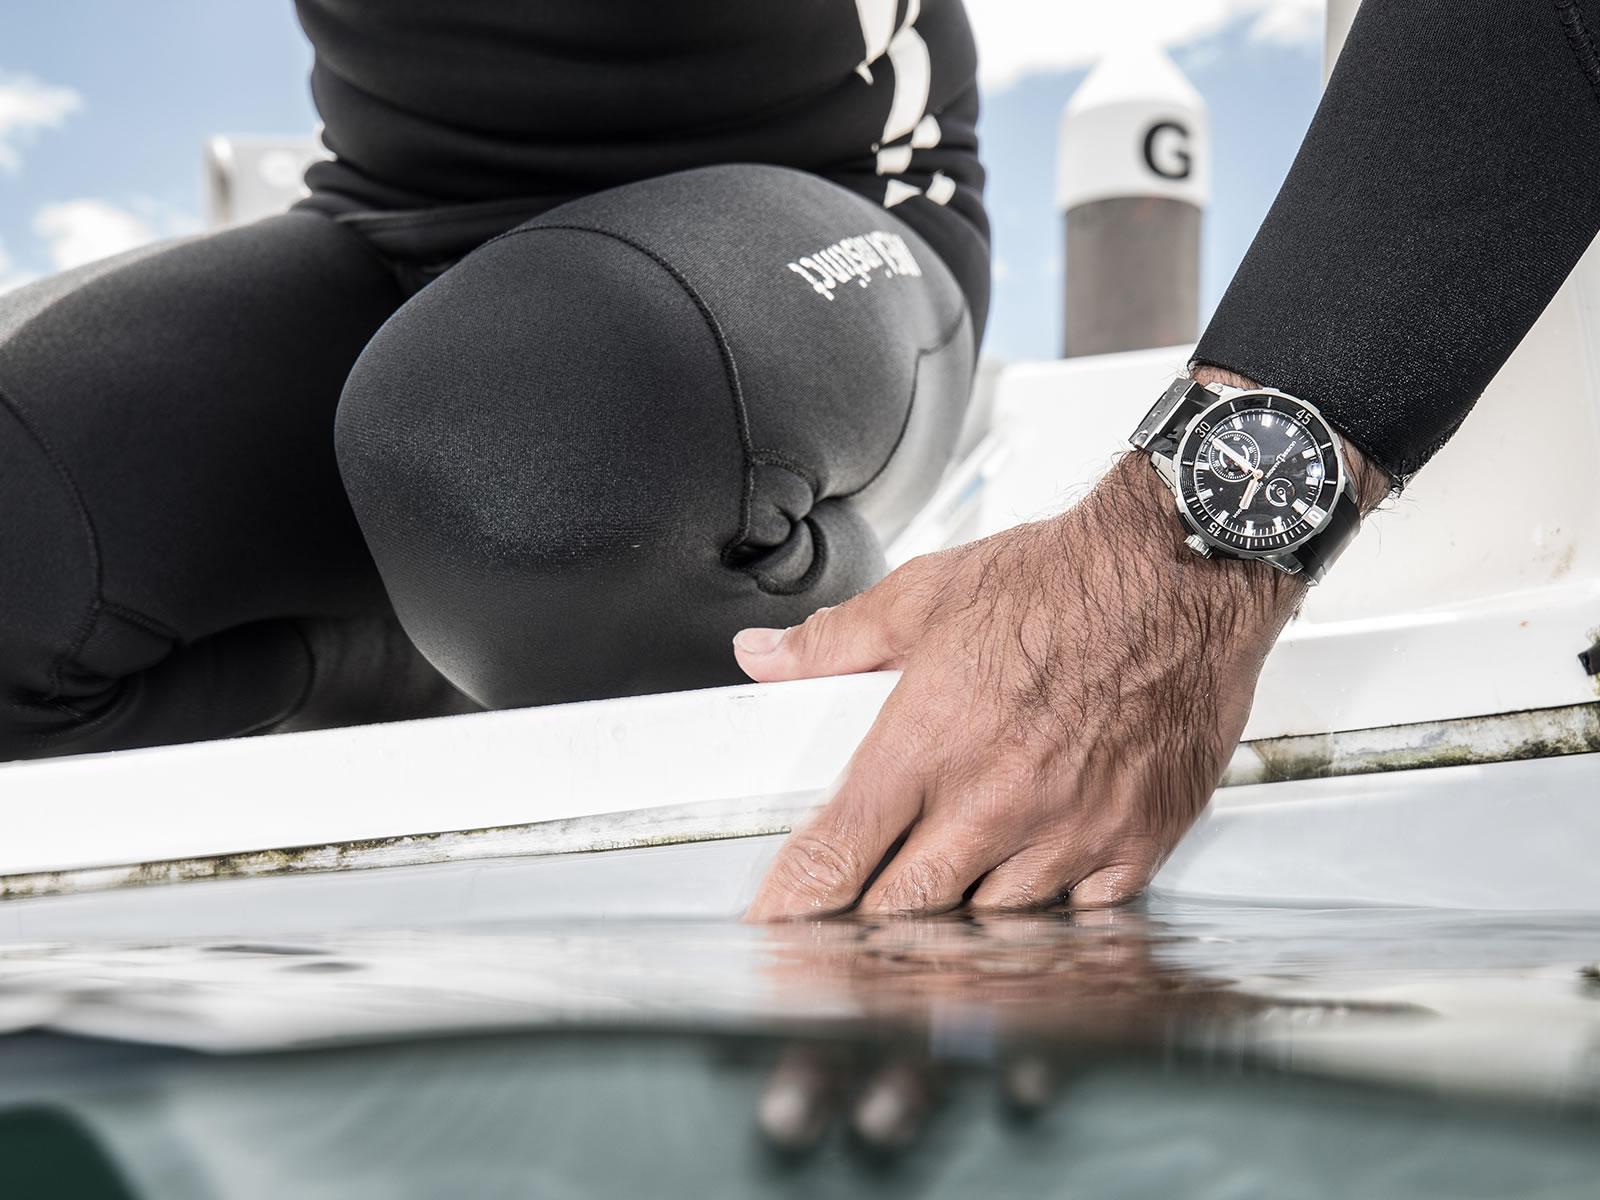 ulysse-nardin-diver-chronometer-2018-models-12-.jpg